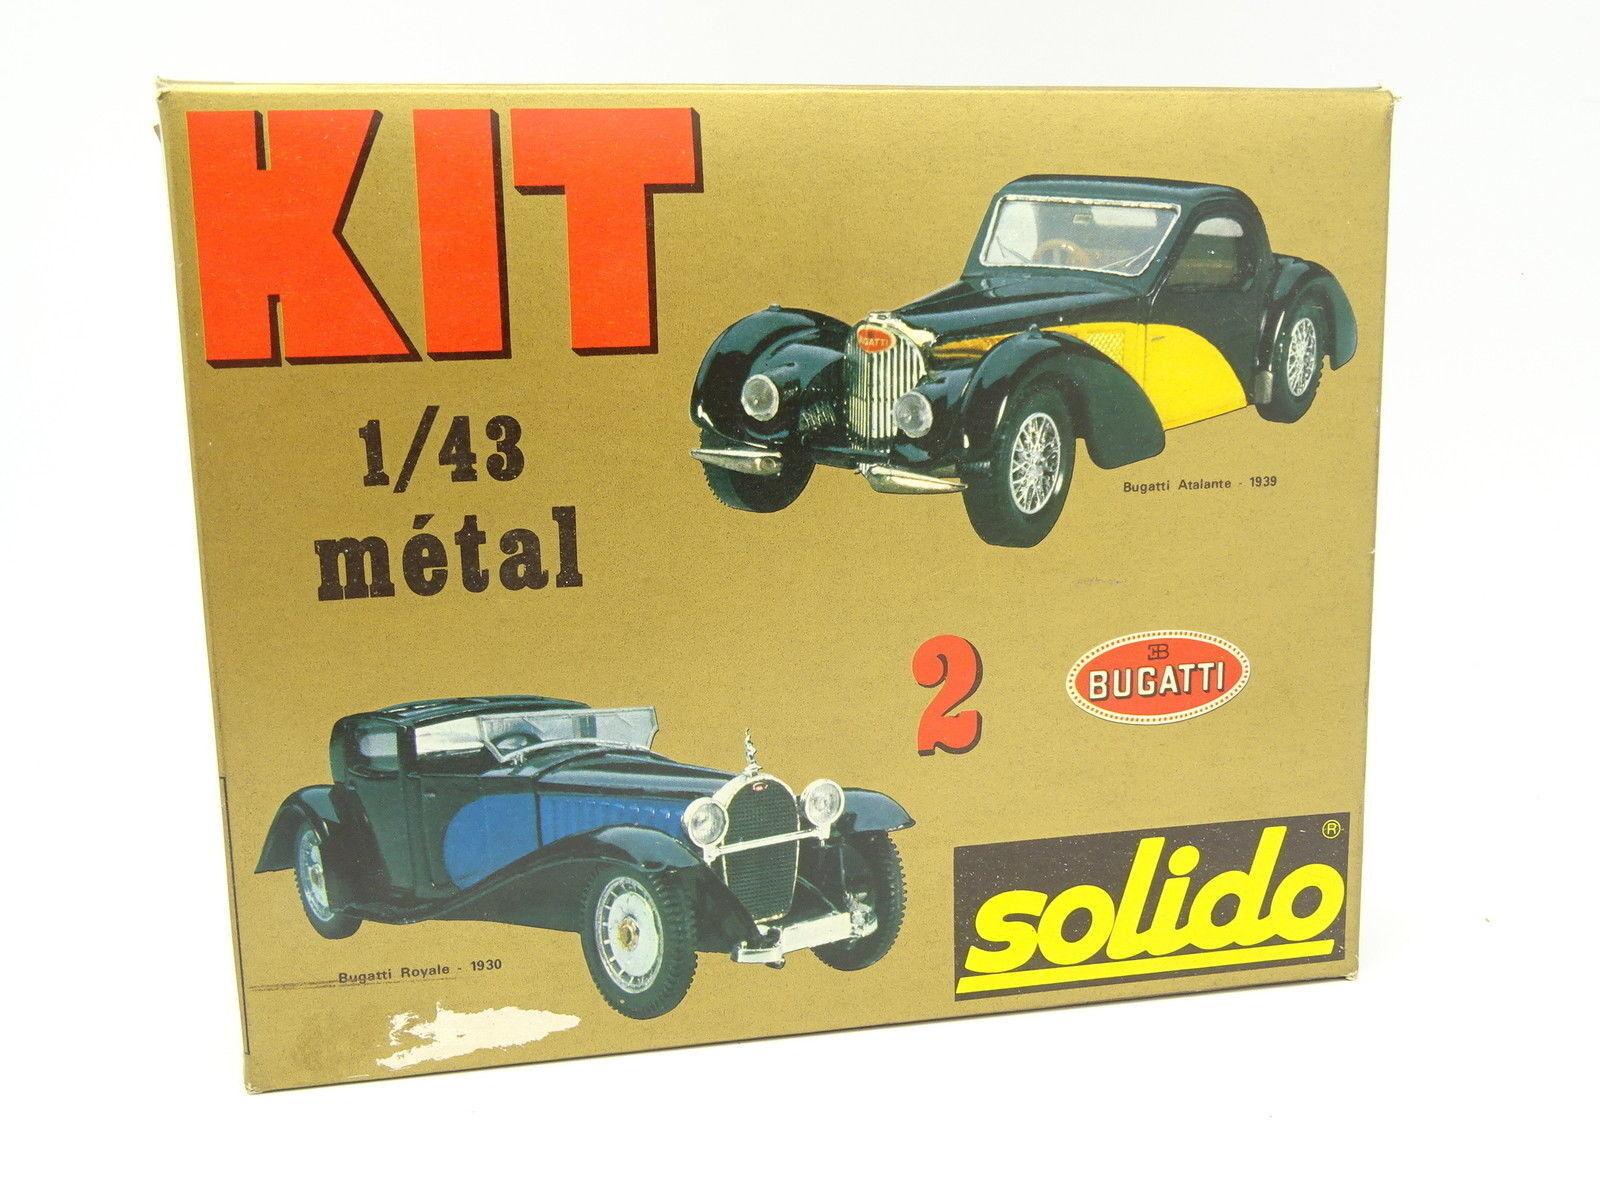 Solido Solido Solido Kit para Montar 1 43 - Bugatti Atalante 1939 y Real 1930 66f767